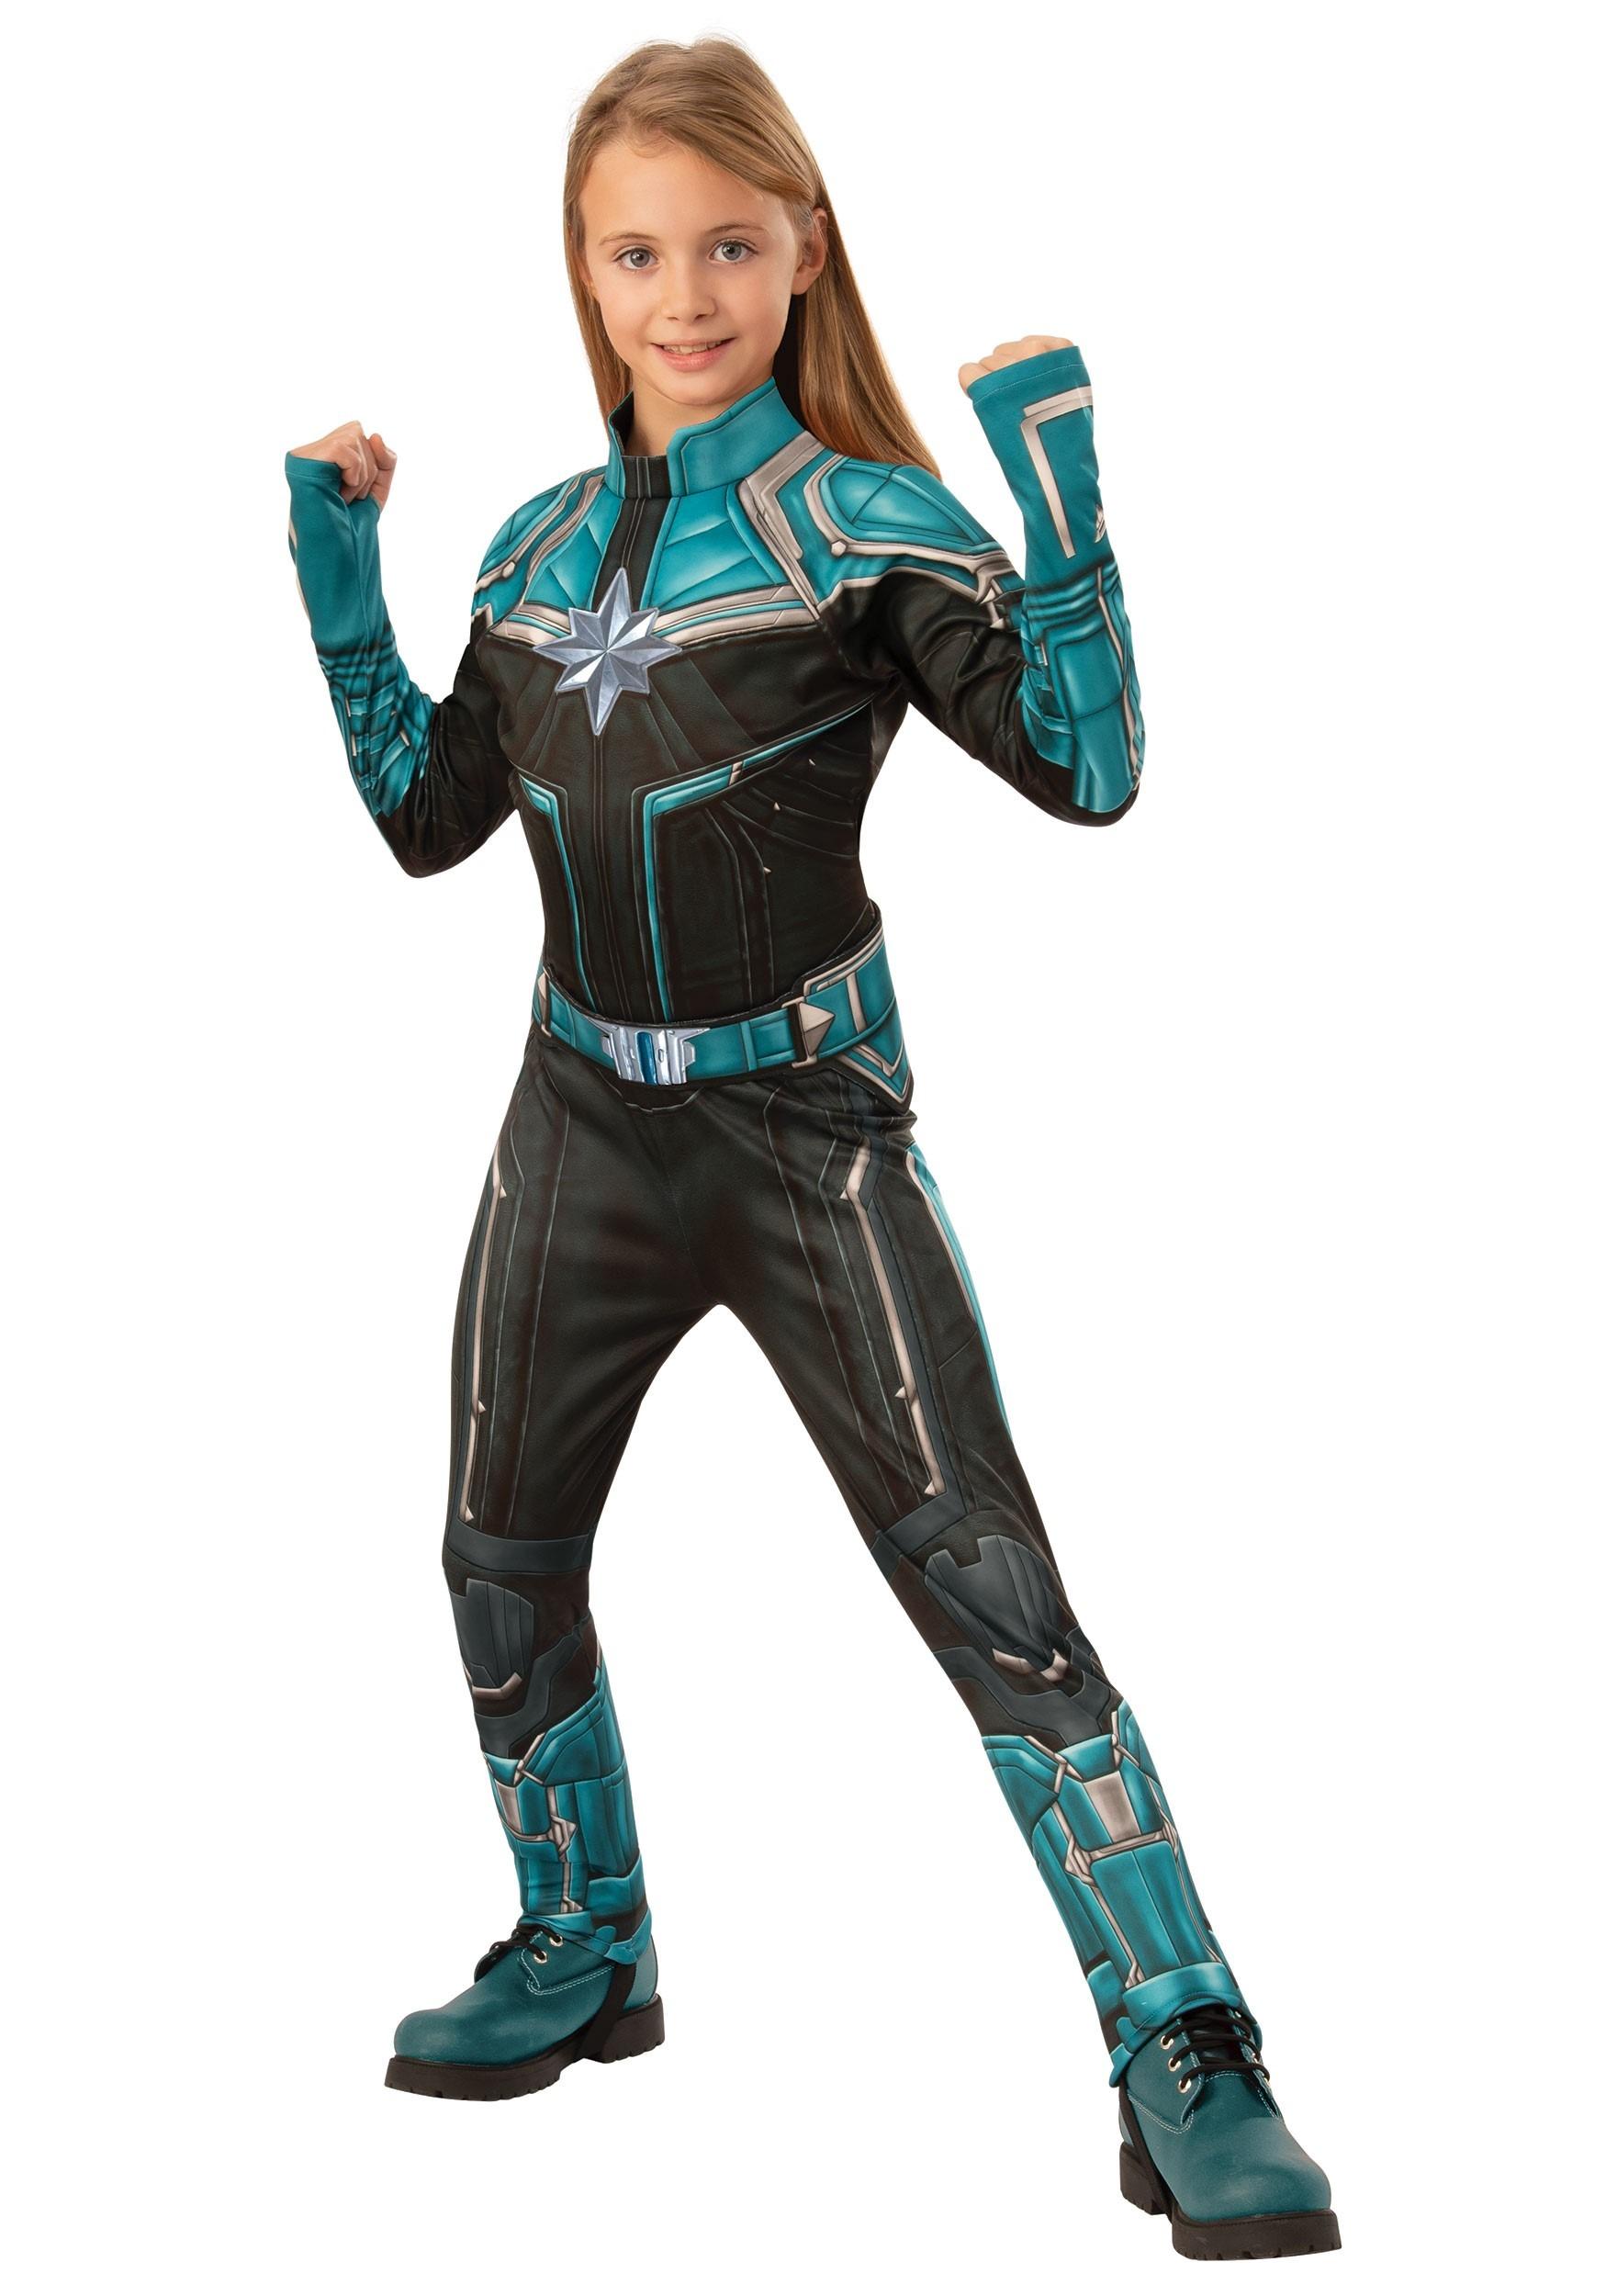 Deluxe Captain Marvel Kree Suit Girls Costume